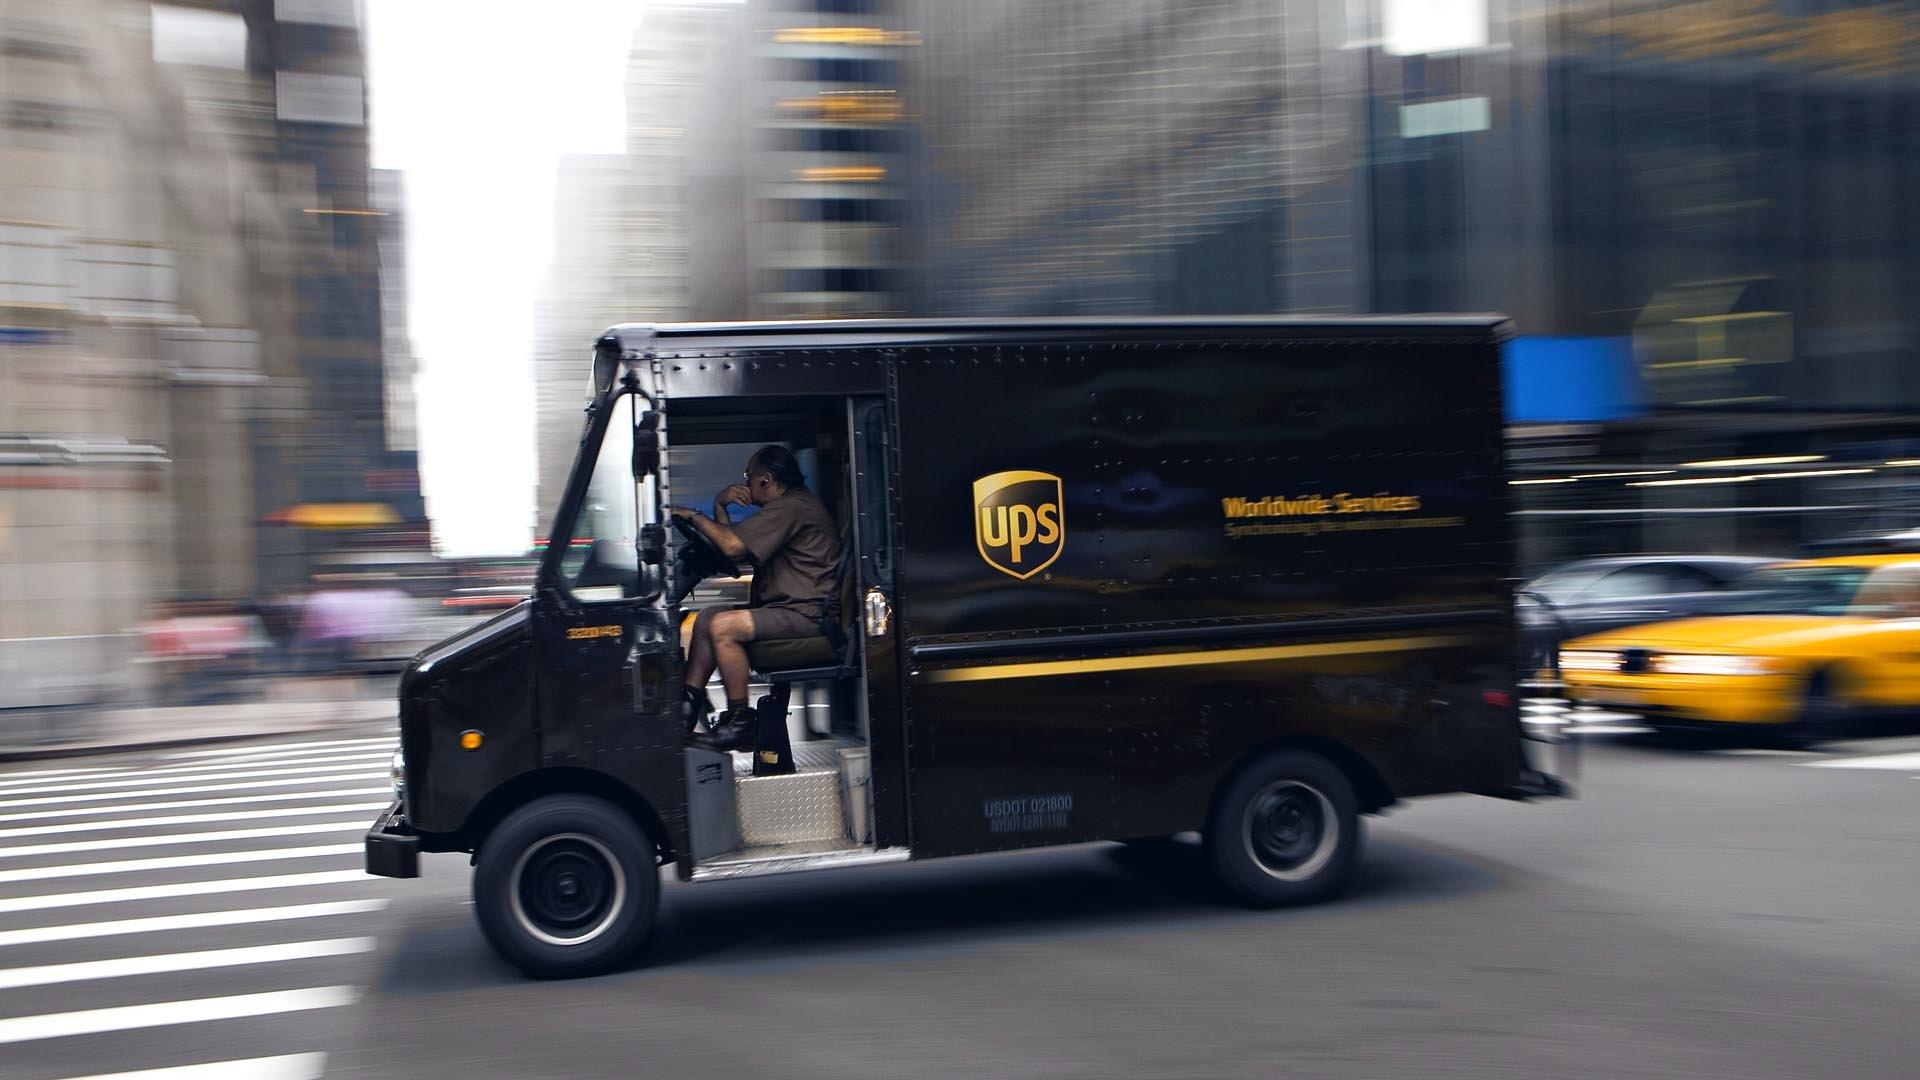 UPS navigatore Orion